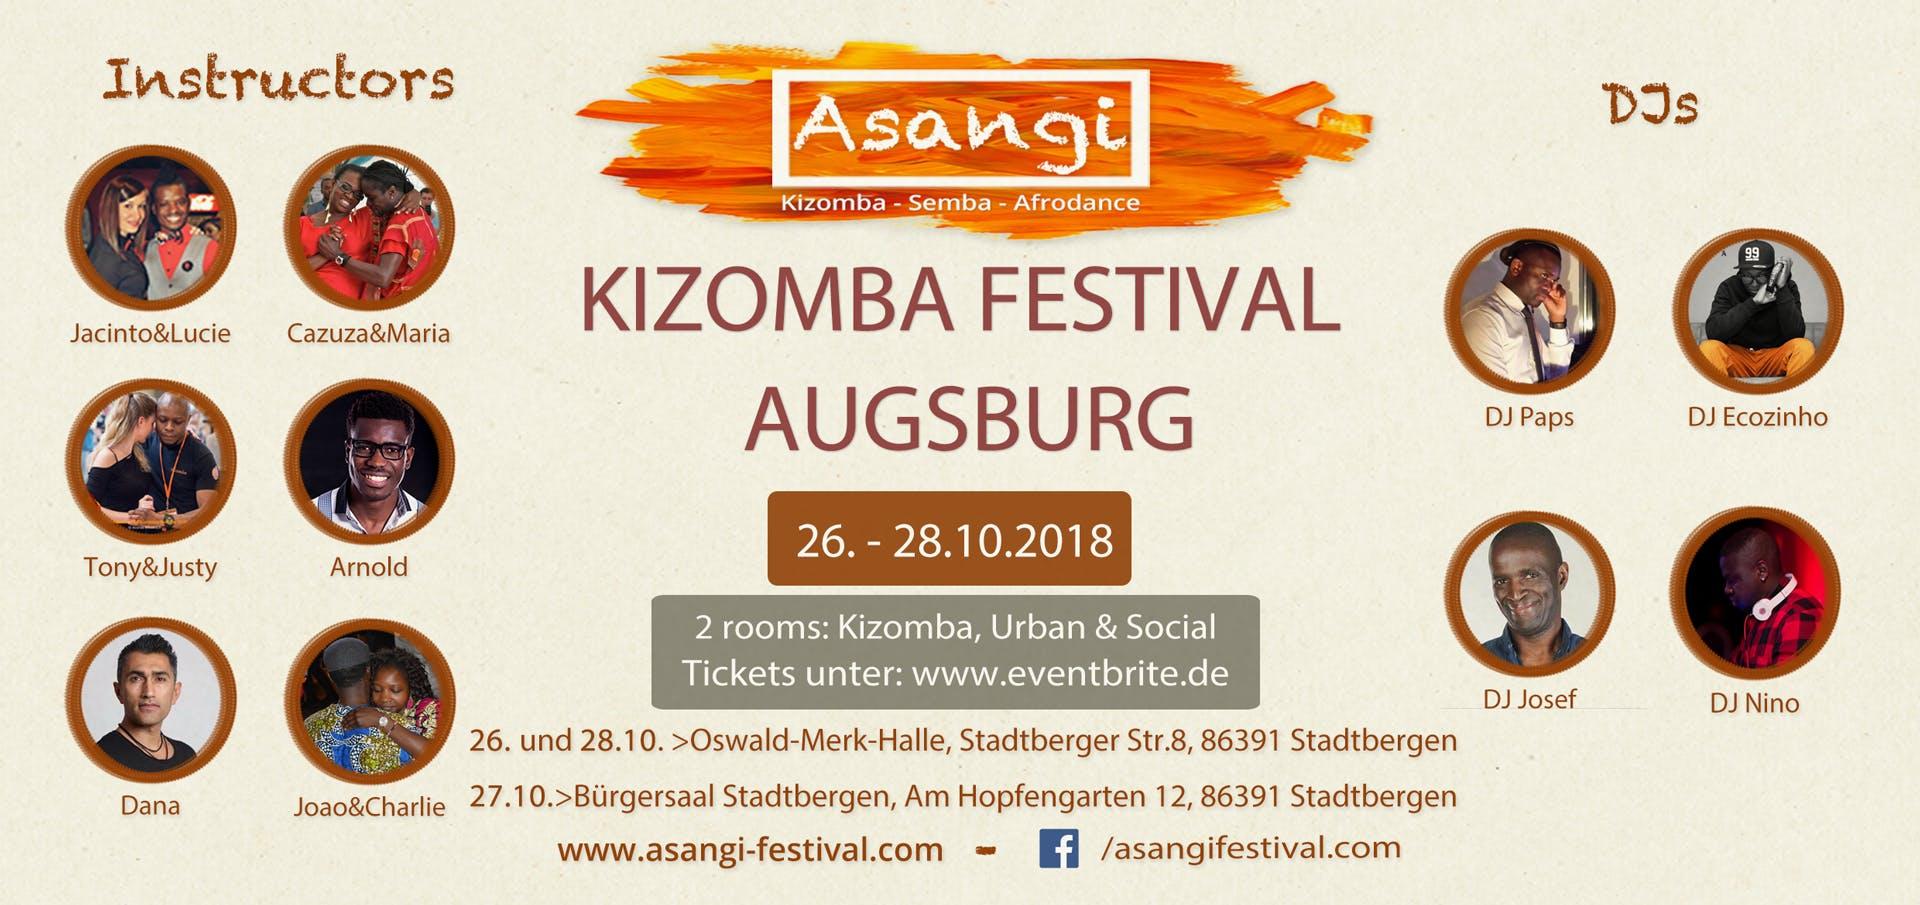 ASANGI-KIZOMBA-FESTIVAL-AUGSBURG 2th Edition